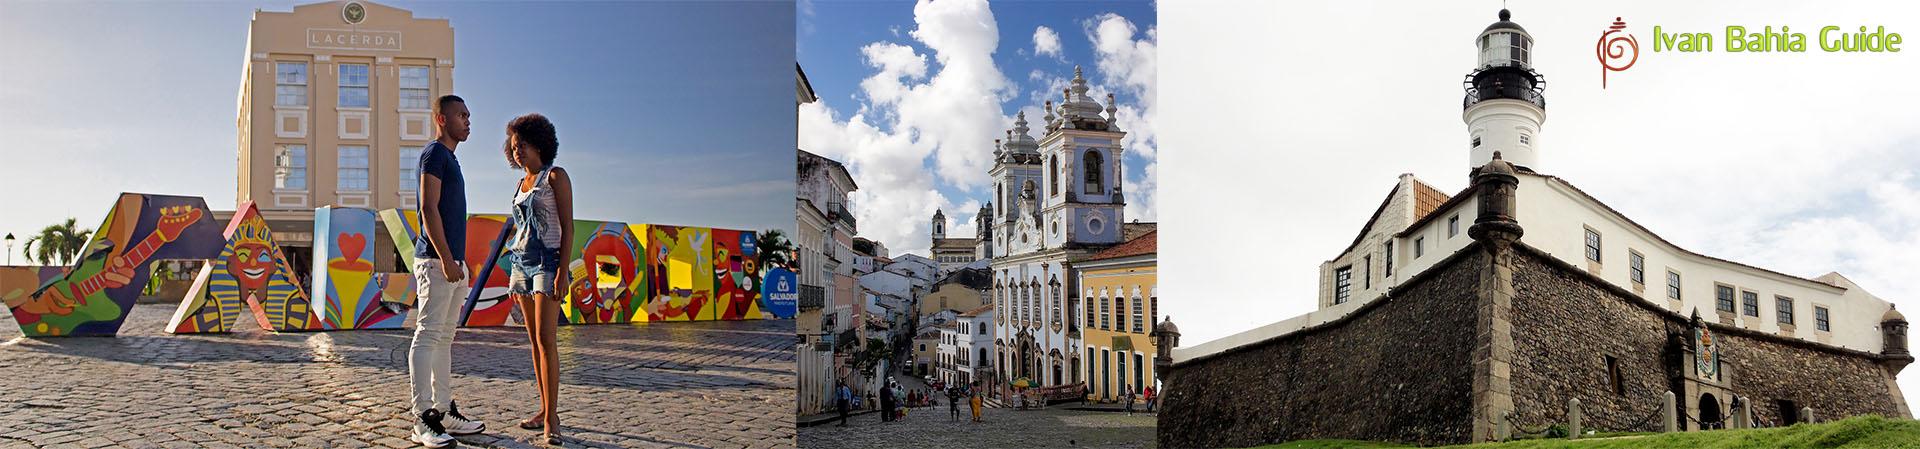 Ivan Bahia Guide, visit to colonial city Cachoeira in the Recôncavo Baiano #ivanbahiaguide #ivanbahiareisgids #bestofbrazil #ibg #bahiametisse #fotosbahia #salvadorbahiabrazil #bahiatourism #ibtg  #ivansalvadorbahia #salvadorbahiatravel #toursbylocals #fernandobingretourguide #fotoschapadadiamantina  #chapadadiamantinatransfer #SalvadorTourGuide #chapadadiamantinatrekking #lencois #lençois #gaytravelbrazil #homotravel #brazilhoneymoon #diamantinamountains #valedopati #valecapao #bahia #morropaiinacio #chapadadiamantinaguide #discoverbrazil #Guidedetourismesalvadorbahiabresil #TransatJacquesVabres #SailingBrazil #maurotours #bahiatopturismo #transfervipsalvador #bahiapremium #booktransfer #maisbahiaturismo #cassiturismo